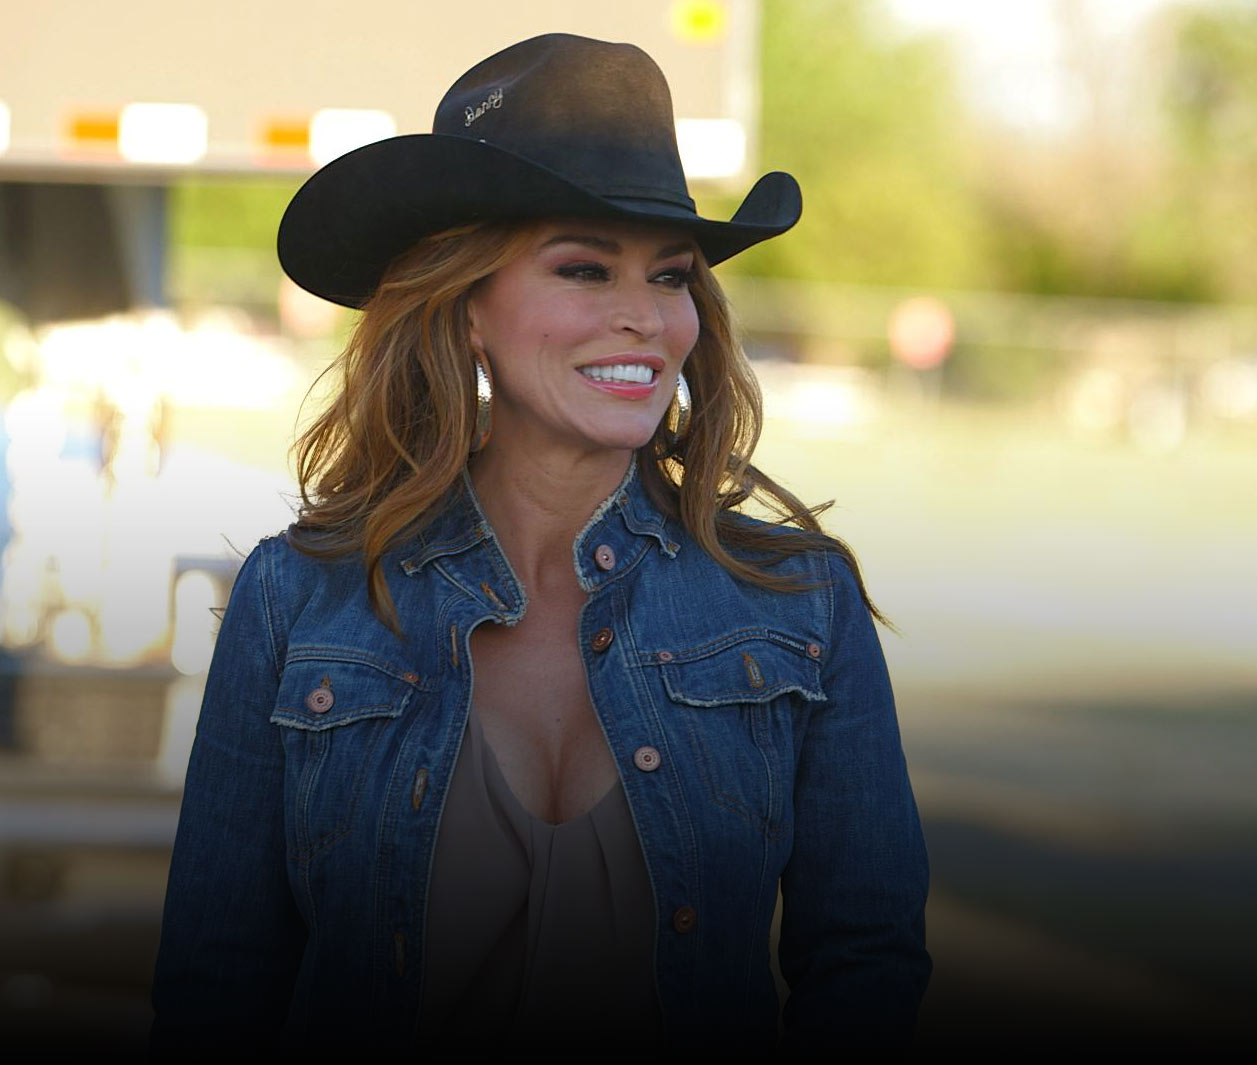 rodeo girls on aampe awful gbcn